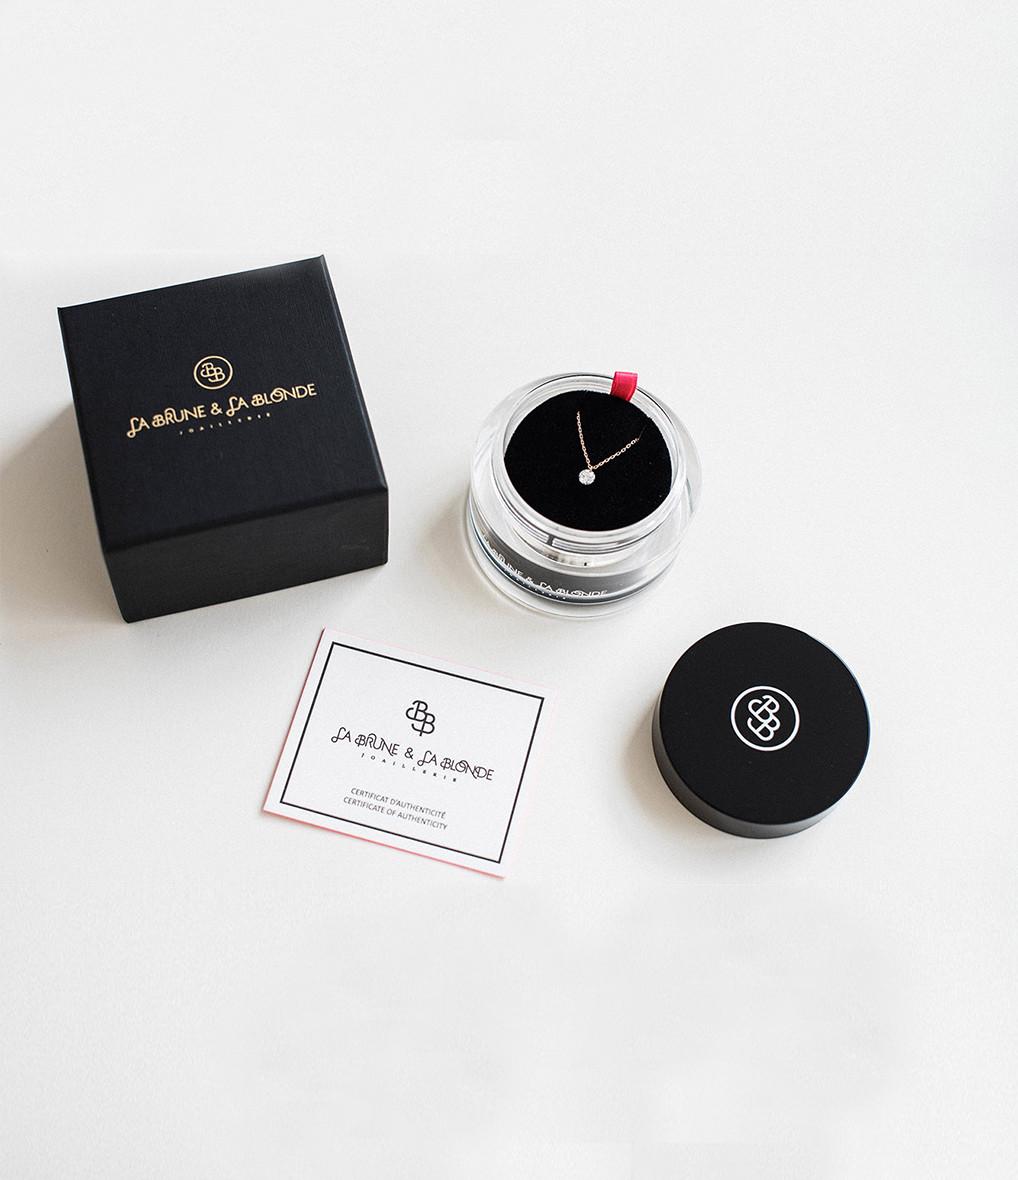 LA BRUNE & LA BLONDE - Collier Confetti Saphir Rose Or Rose